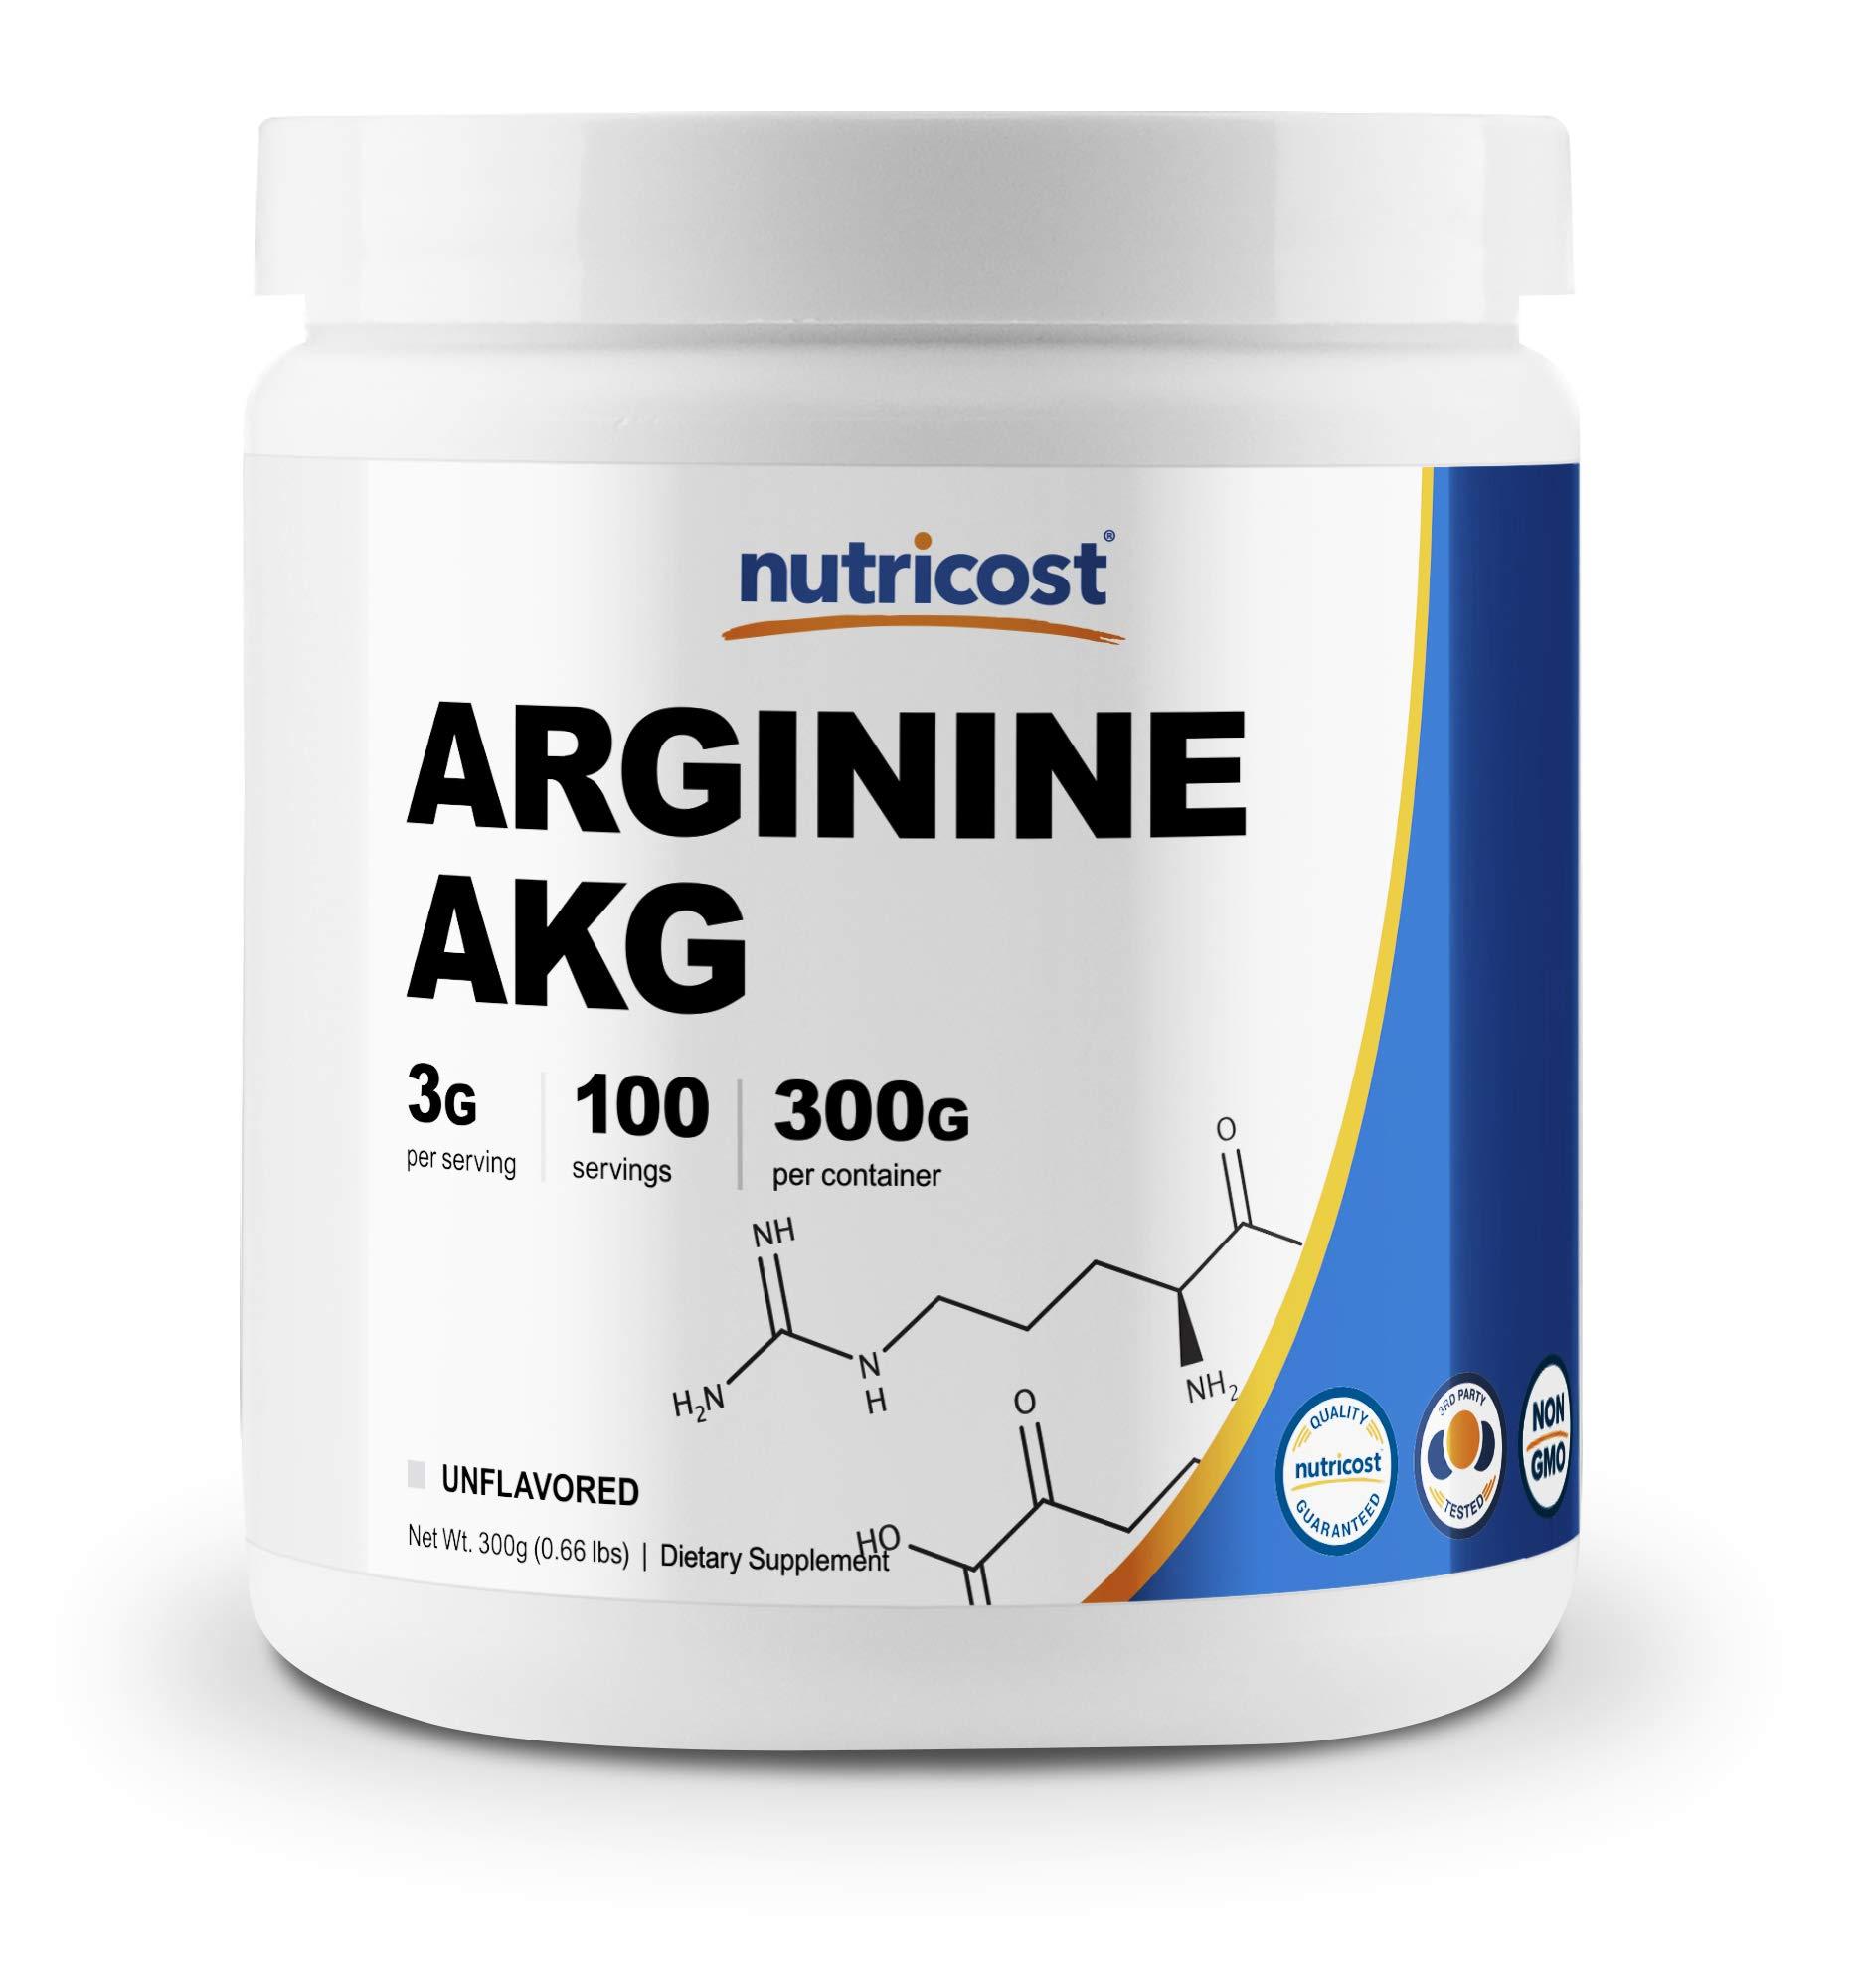 Nutricost Arginine AKG Powder 300 Grams (AAKG) - 3G Per Serving & 100 Servings - Pure Arginine Alpha Ketoglutarate by Nutricost